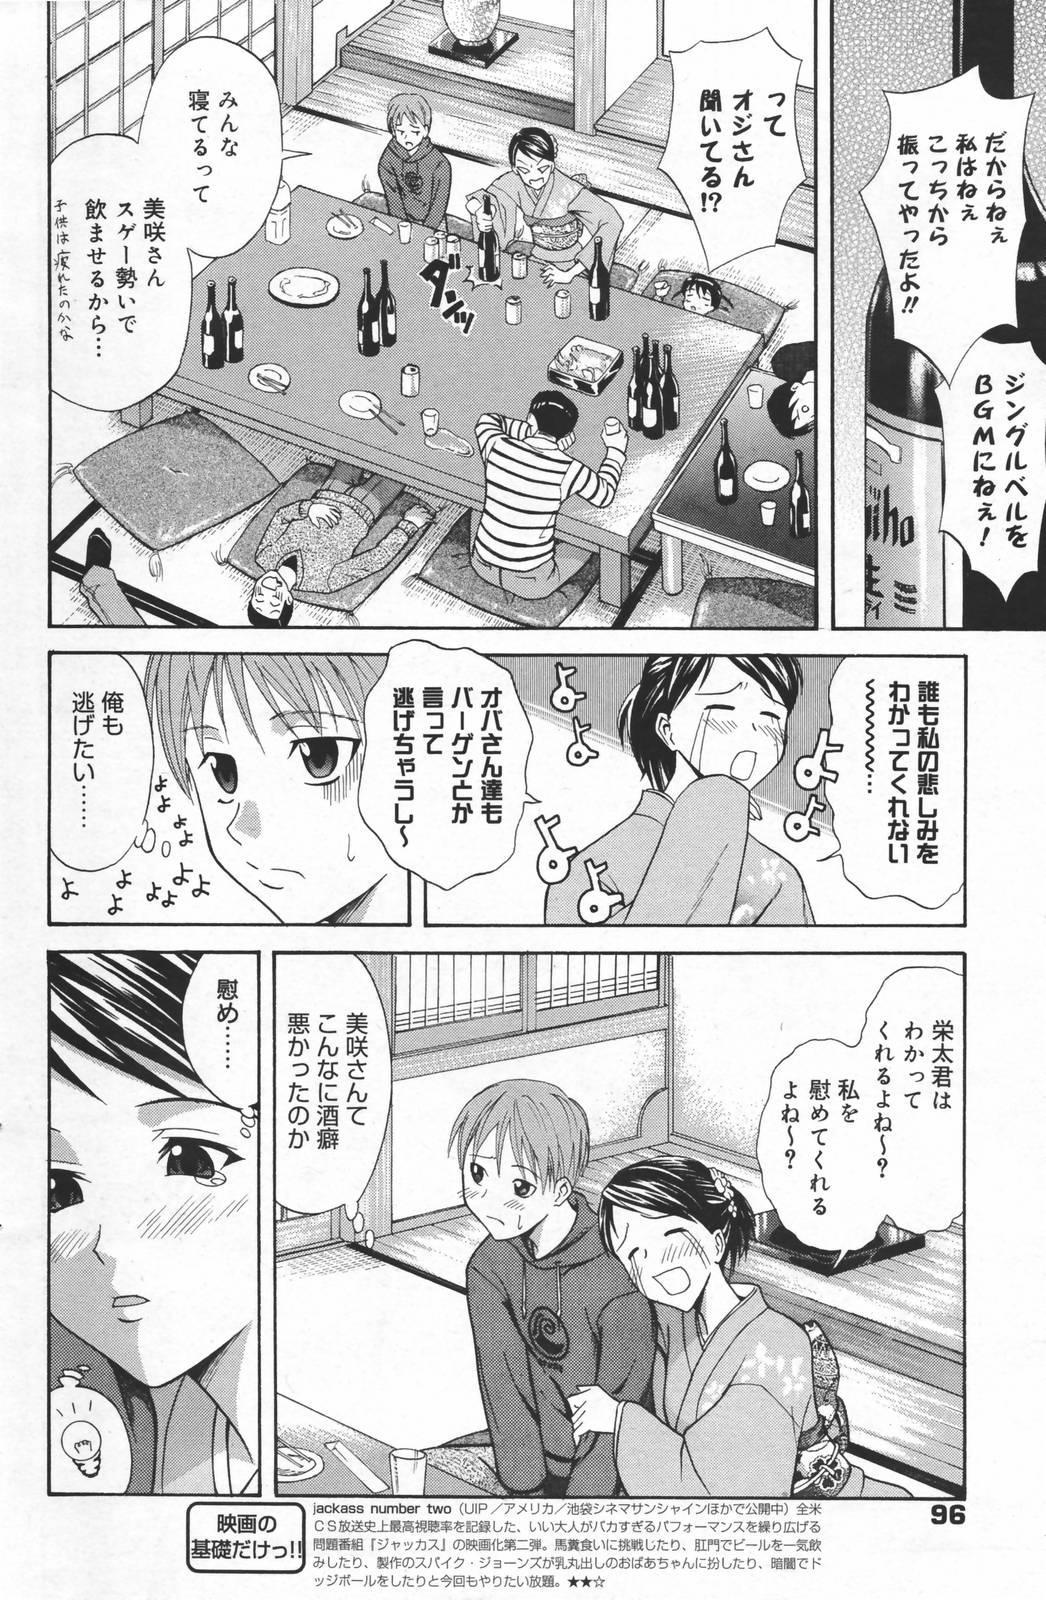 Manga Bangaichi 2007-03 95